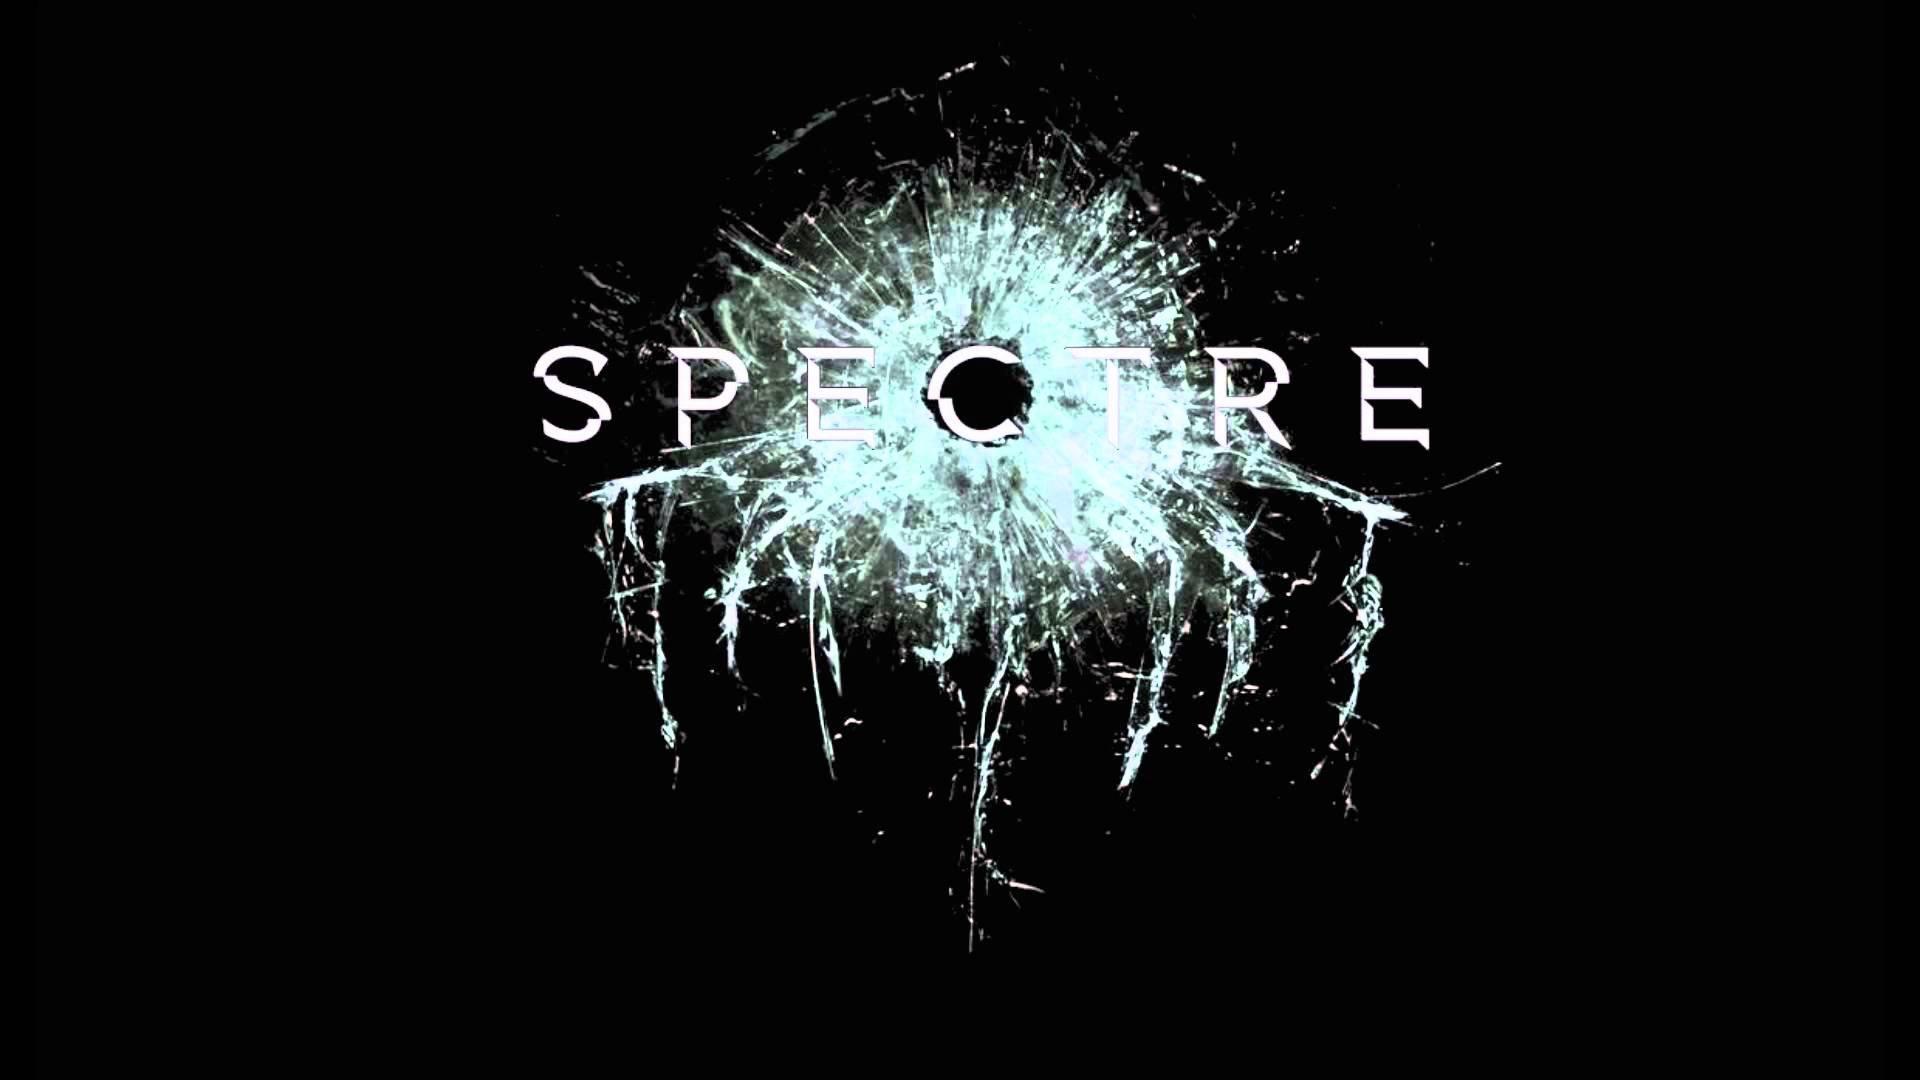 Spectre 007 Wallpaper 1920x1080